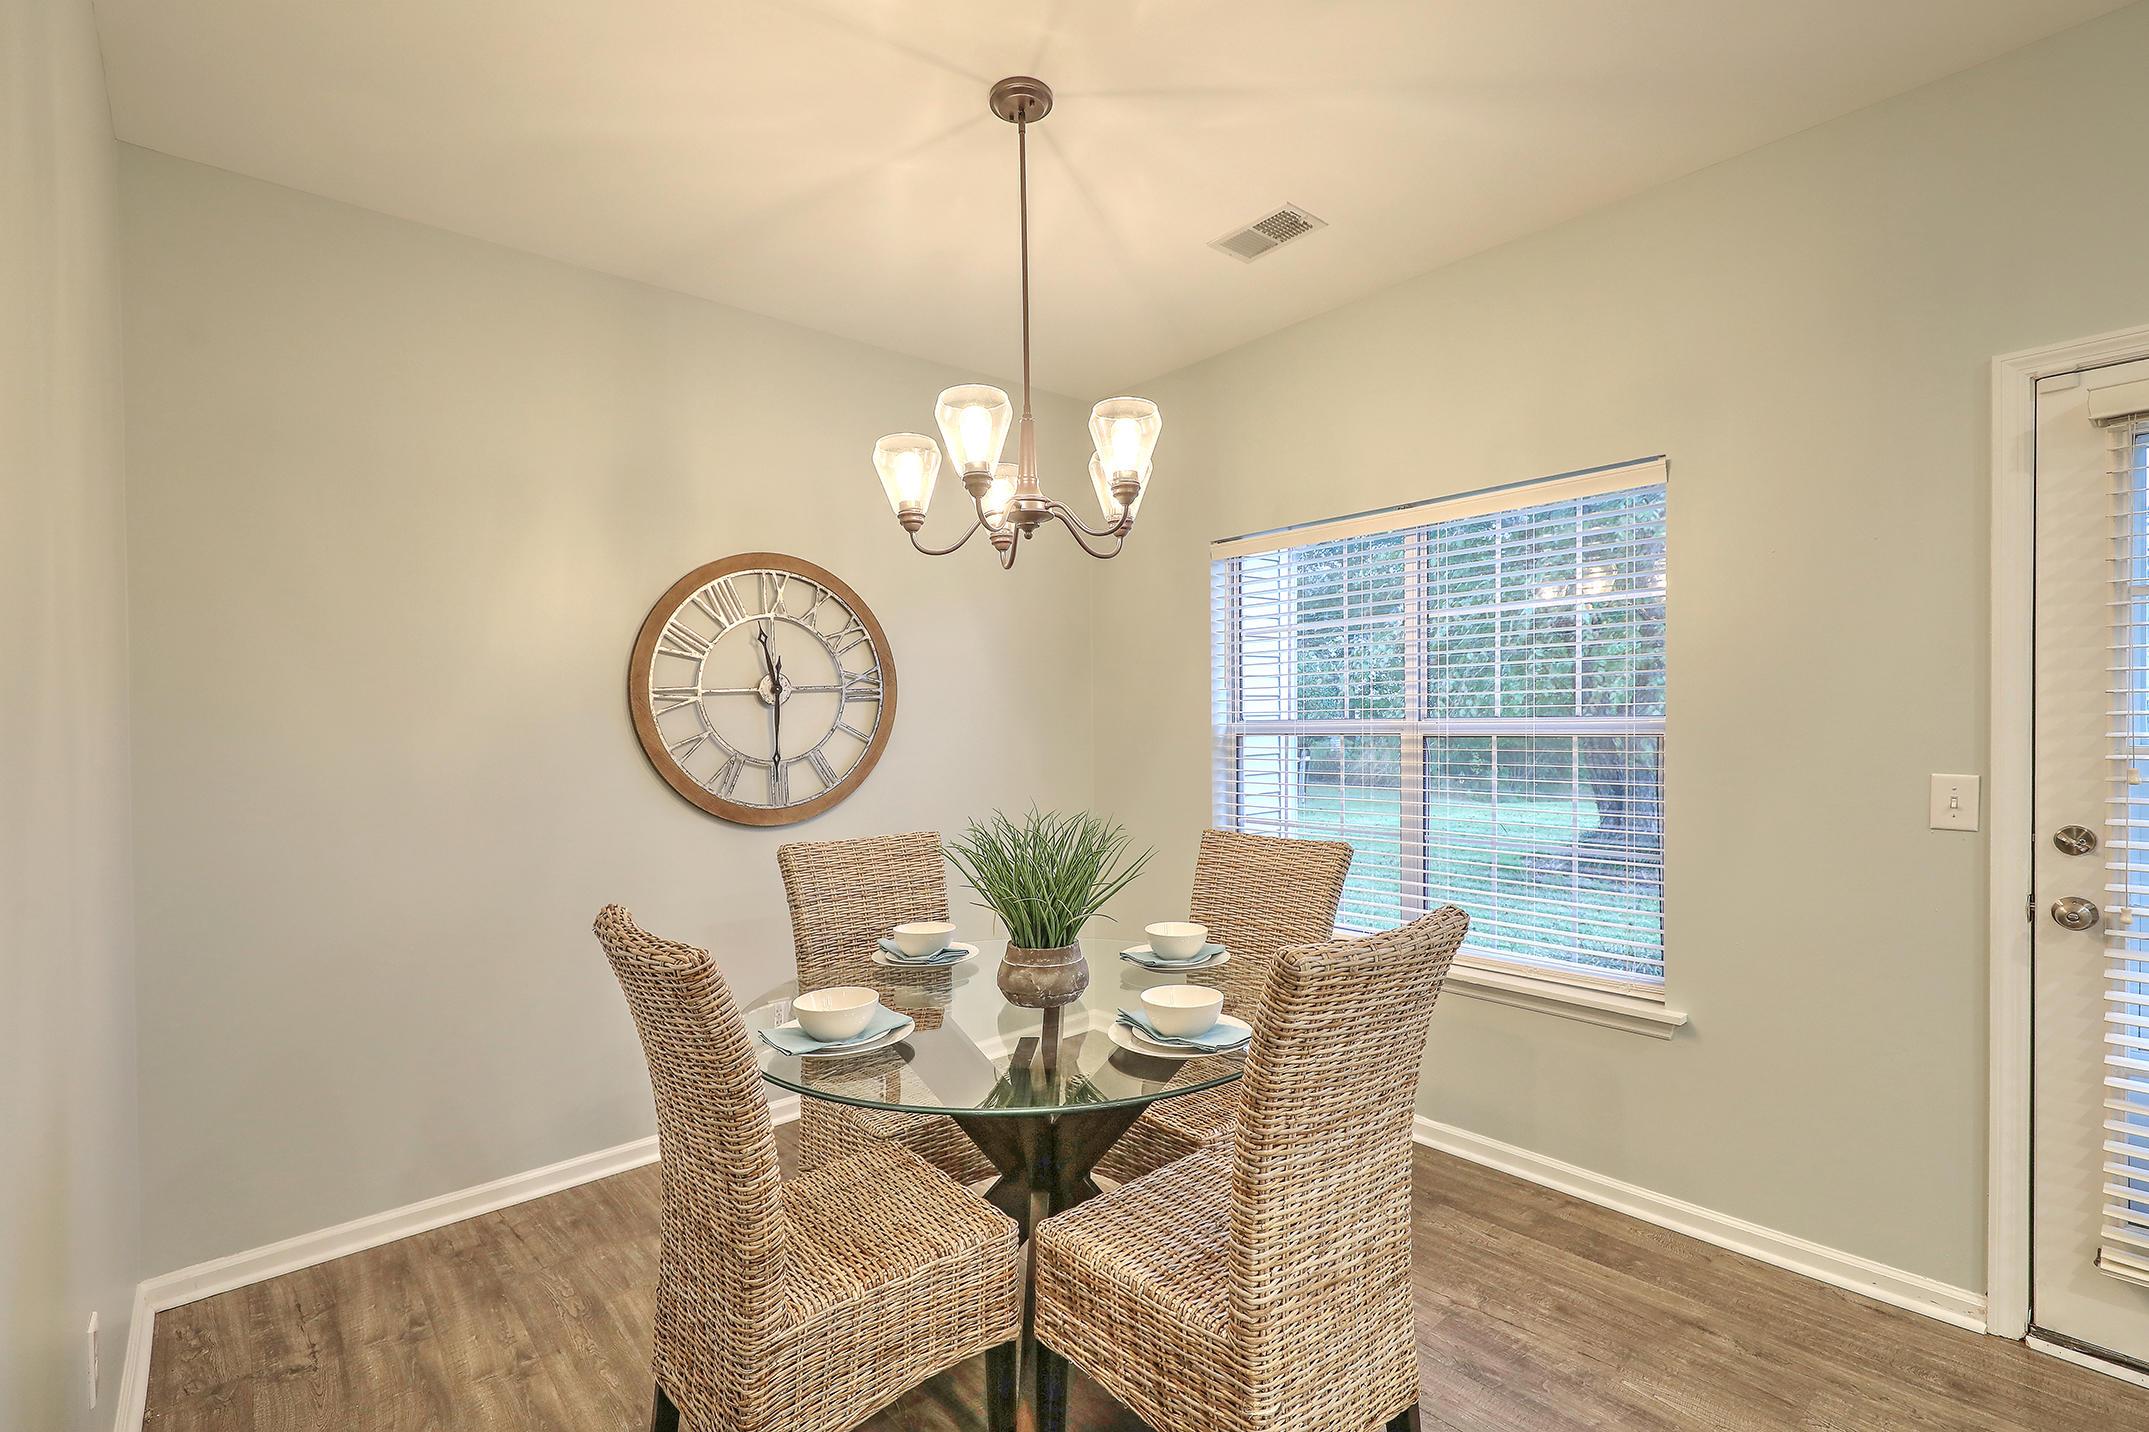 Dunes West Homes For Sale - 1309 Sassafrass, Mount Pleasant, SC - 23